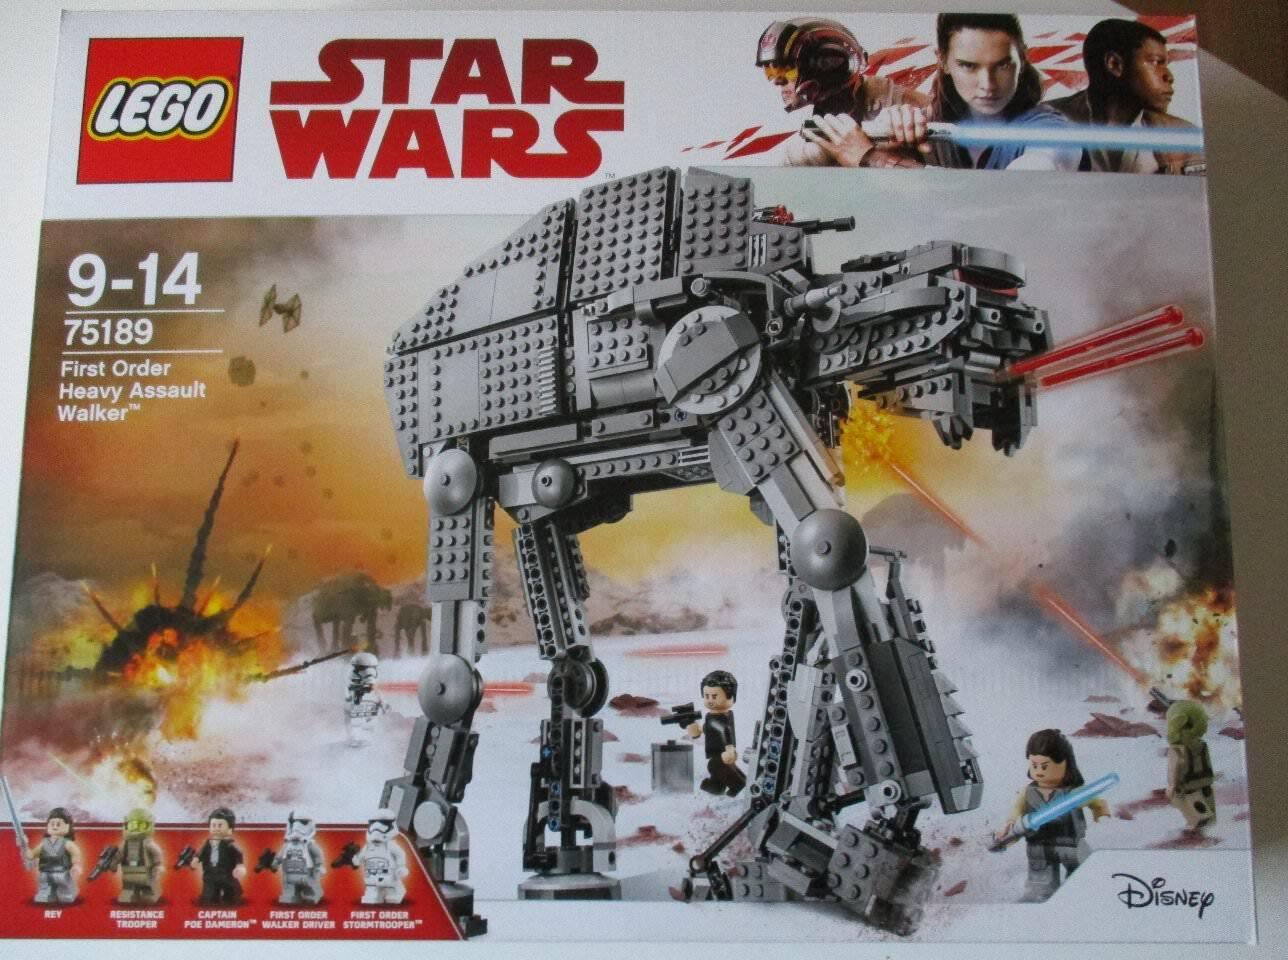 Lego Star  Wars 75189 First Order Heavy Assault Walker Nouveau neuf dans sa boîte  le moins cher